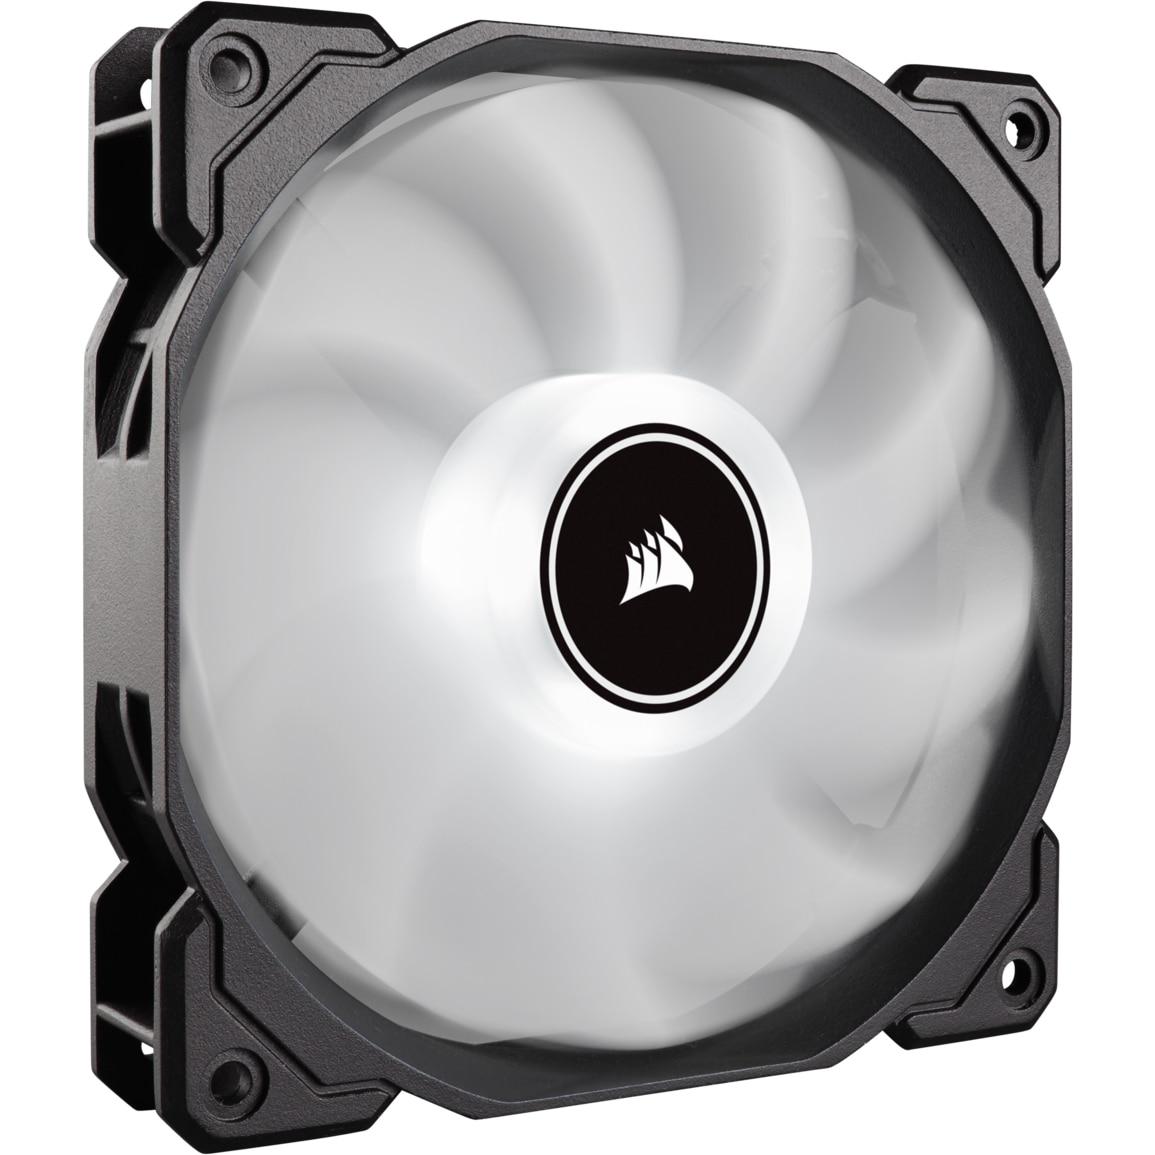 Fotografie Ventilator PC Corsair AF140 LED Low Noise Cooling Fan, 1200 RPM, Single Pack - White